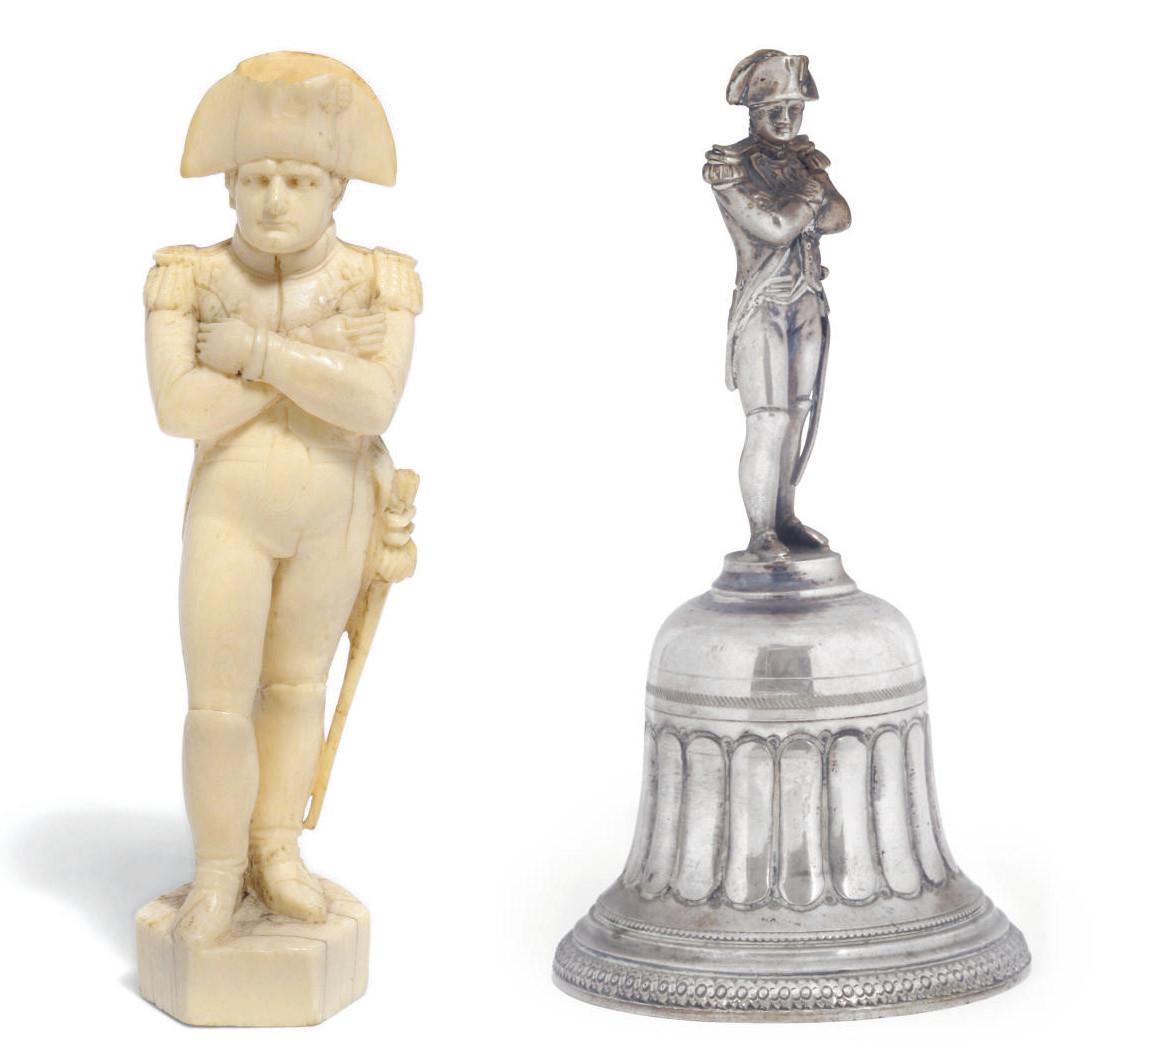 An ivory figure of Napoleon